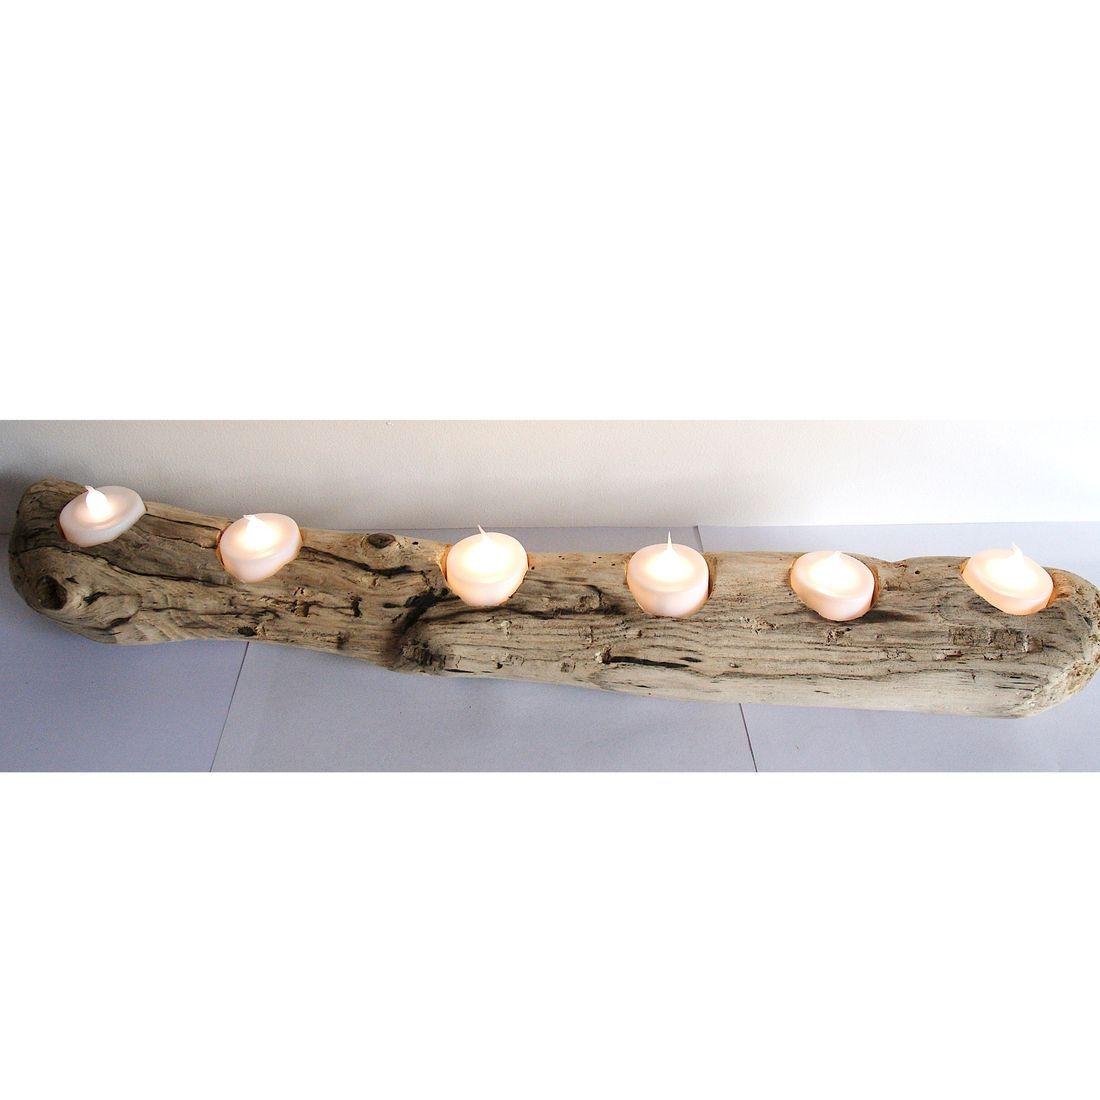 Driftwood log candle tea light holder 3